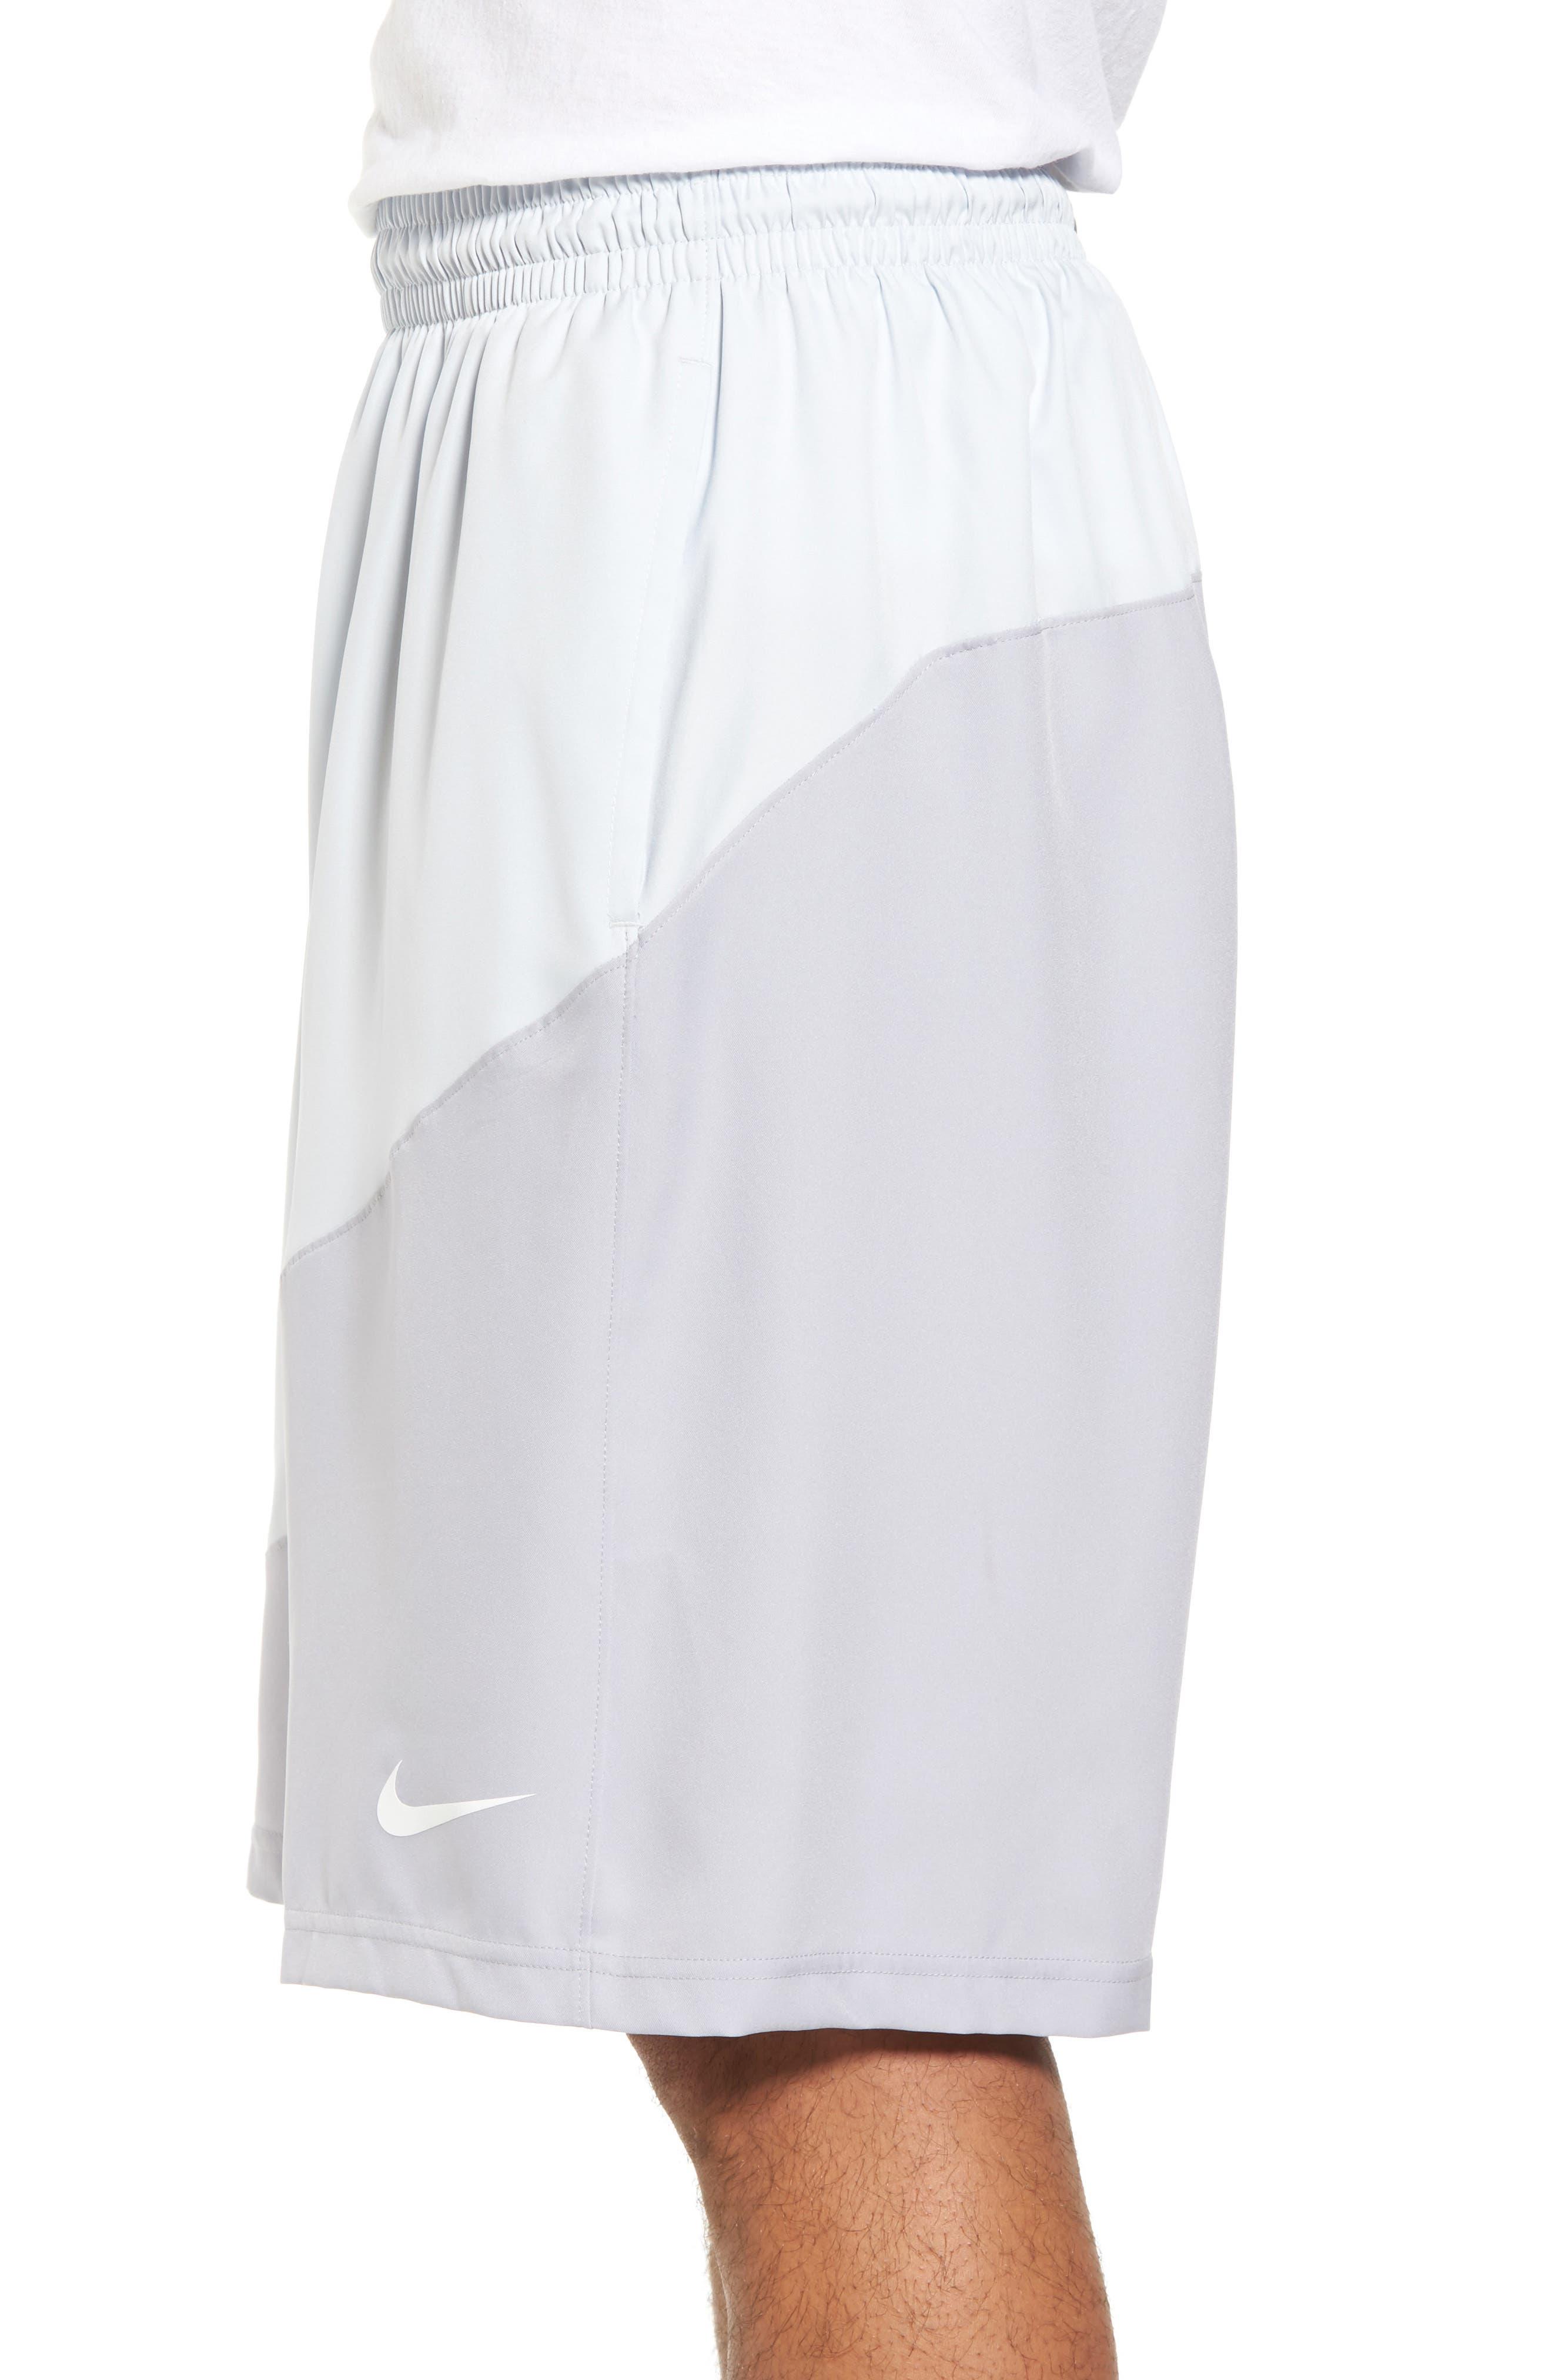 Dry Shorts,                             Alternate thumbnail 3, color,                             Atmosphere Grey/ Smoke/ Black